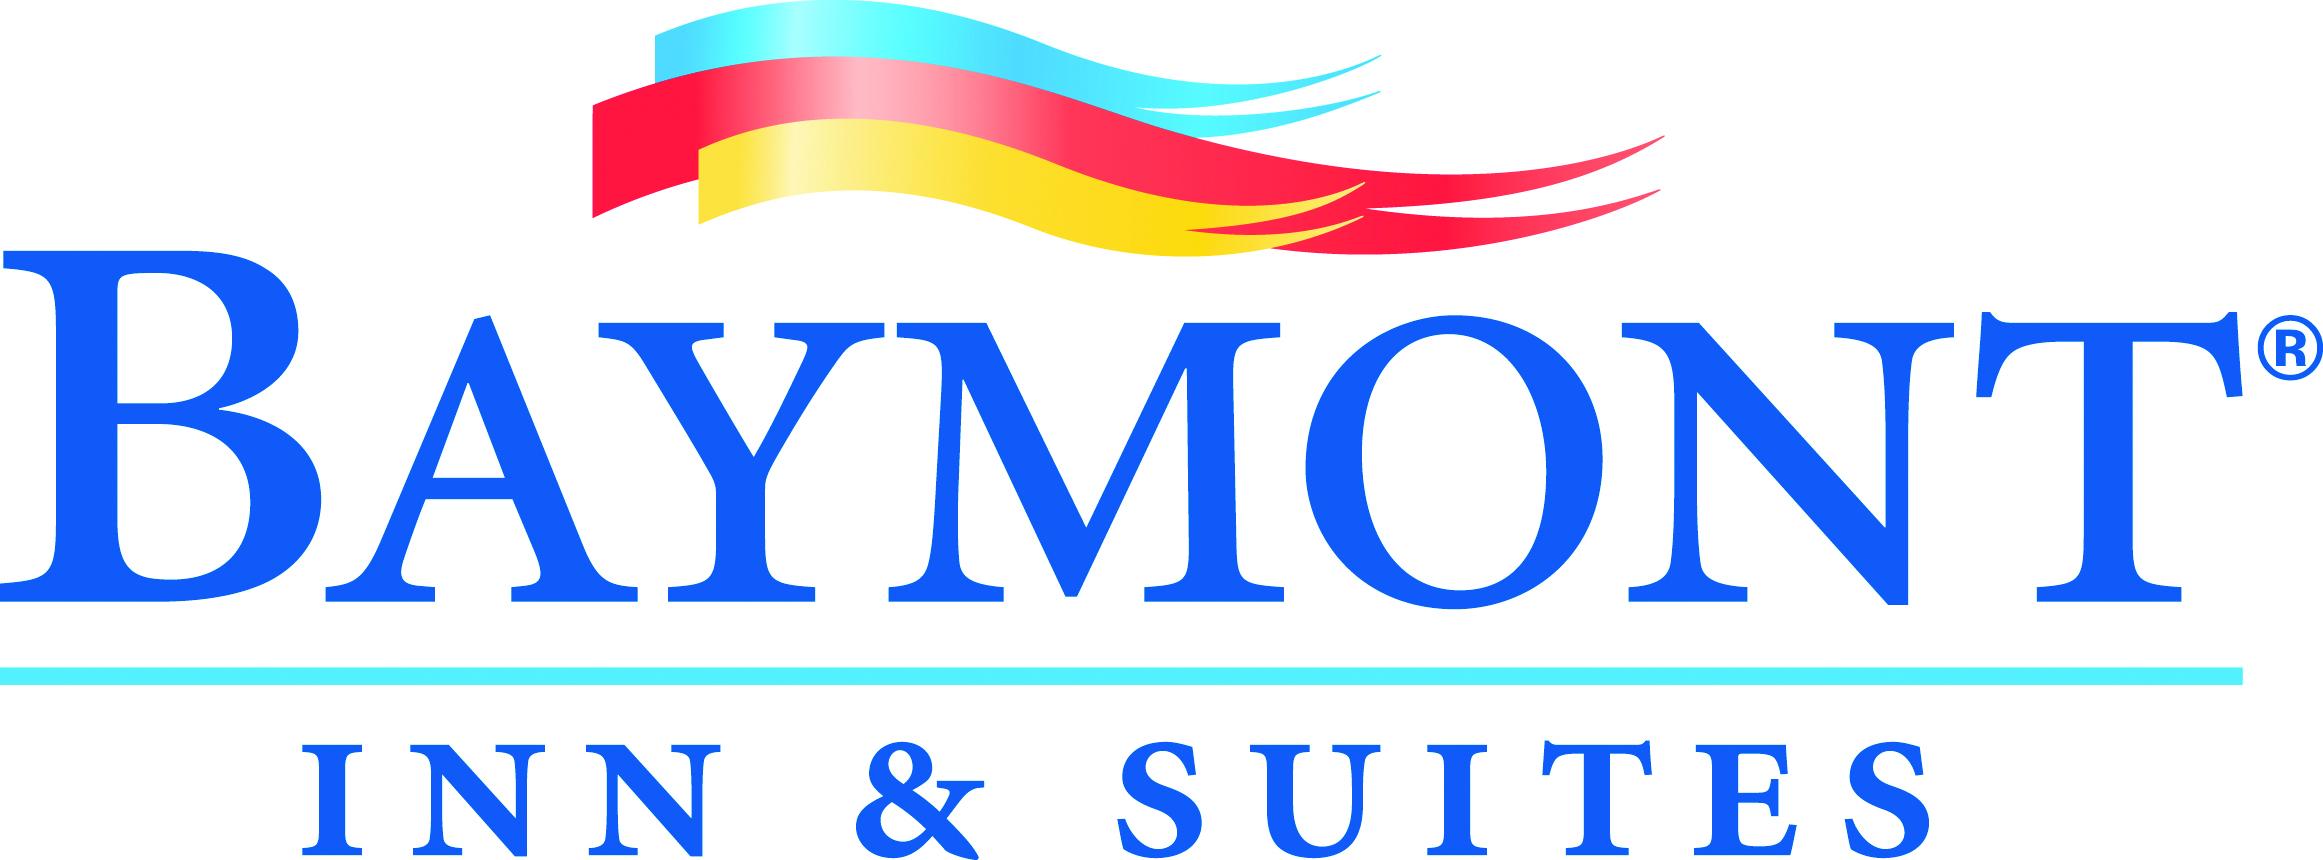 Baymont Inn Logo CMYK.jpg